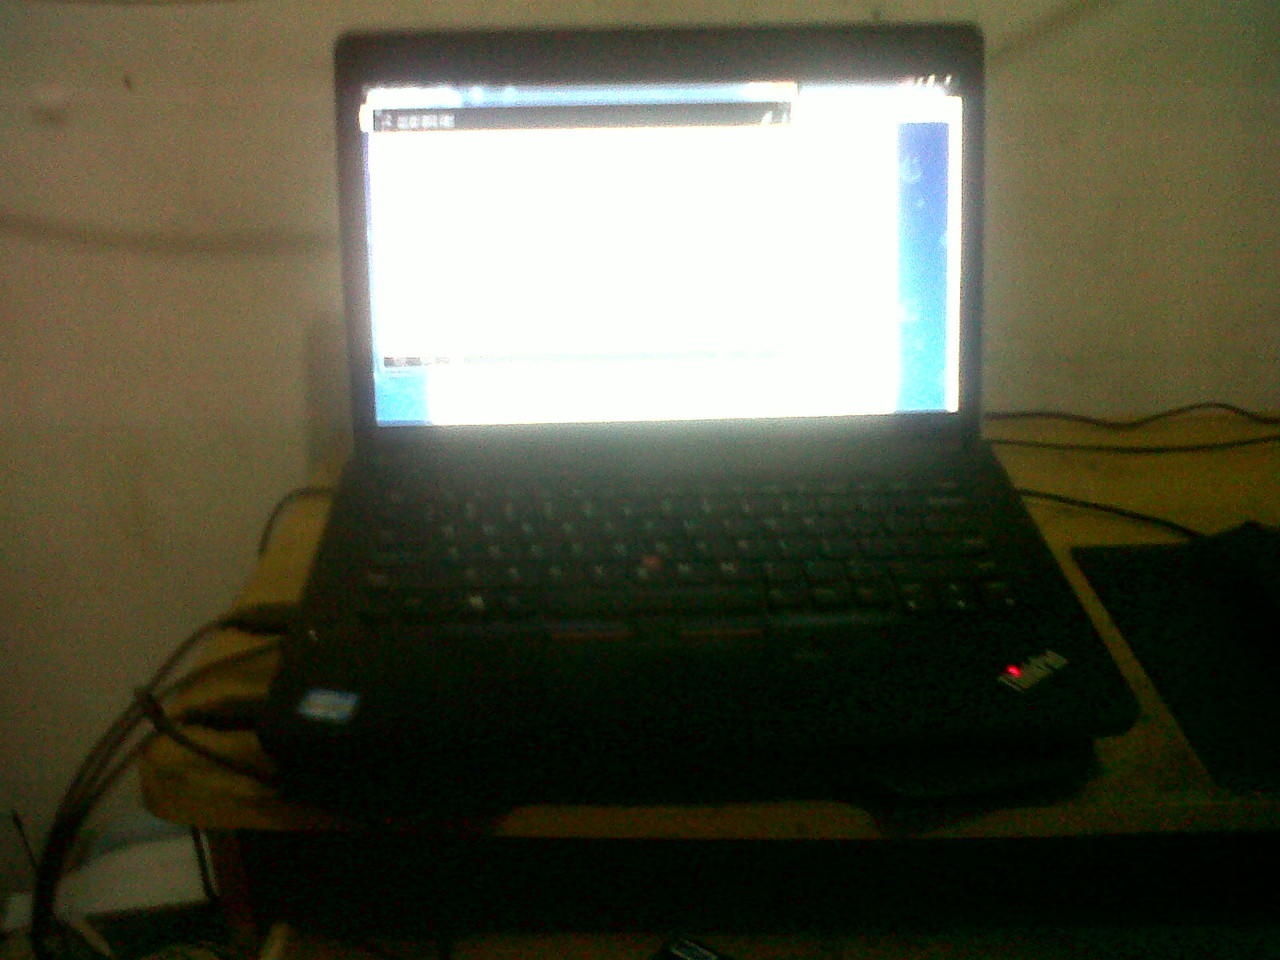 LENOVO E430 i5-3210M 4GB HDD 750GB (BEKASI)